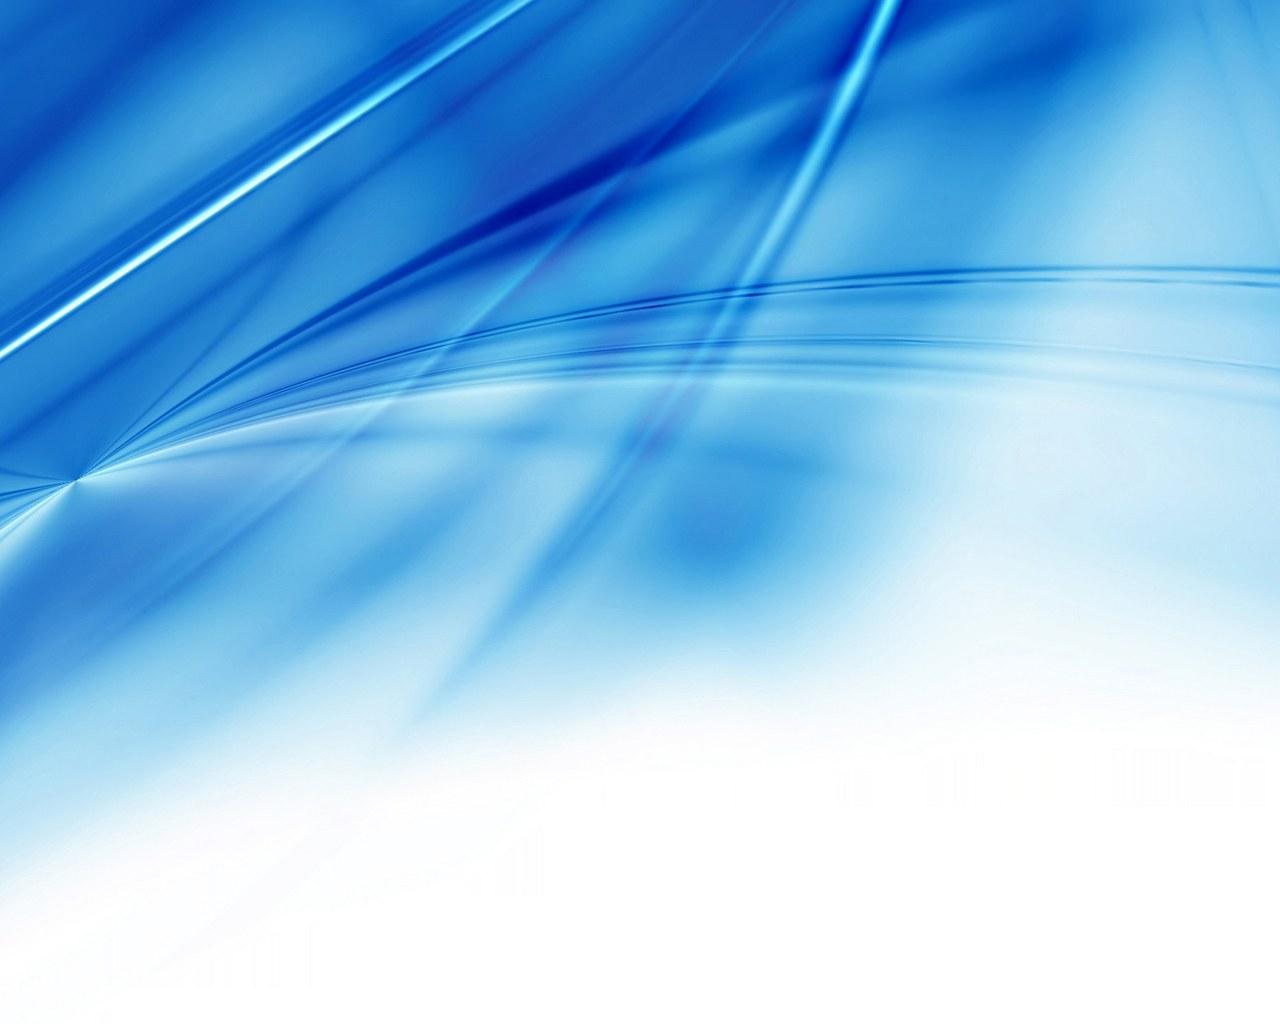 Light Blue Background Wallpaper PicsWallpapercom 1280x1024